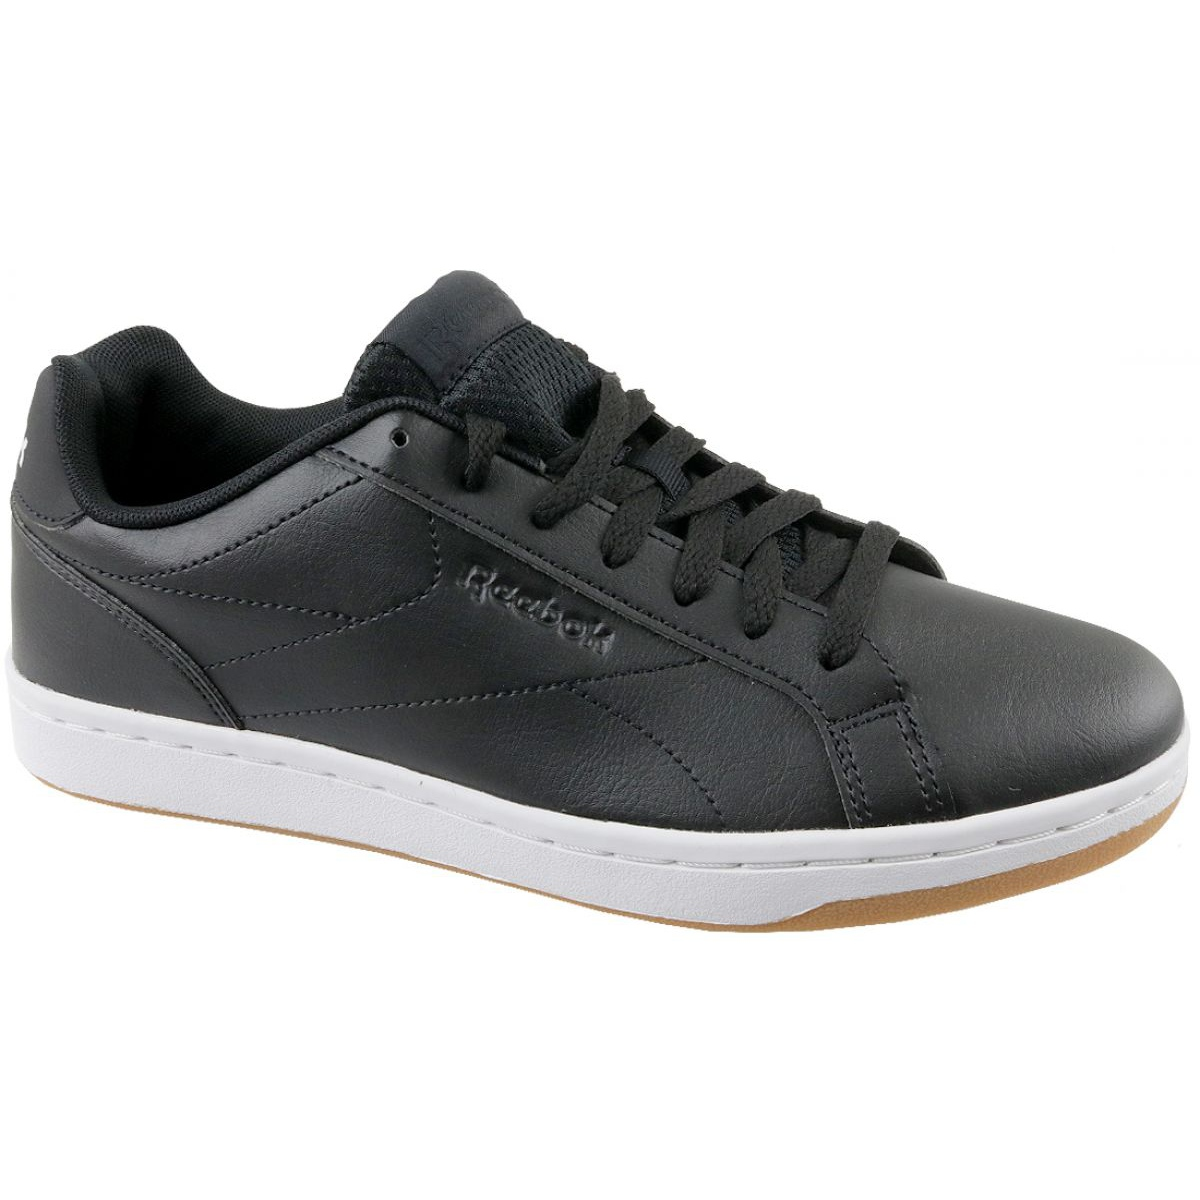 Reebok Royal Complete M BS7343 Schuhe schwarz